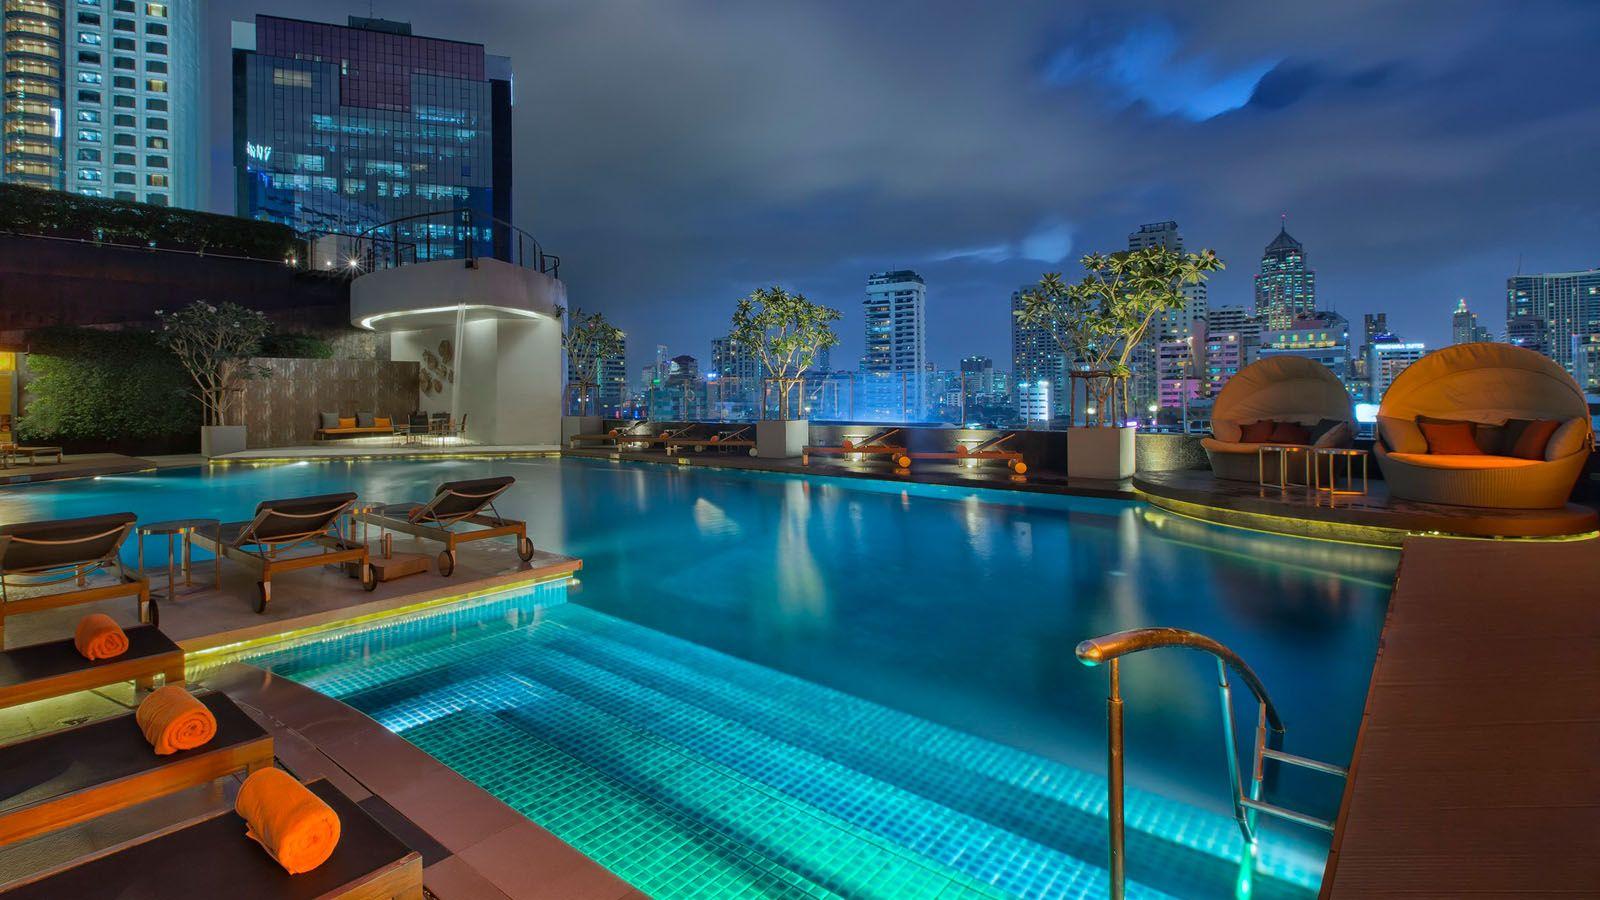 5 Star Hotel Bankok 2018 World 39 S Best Hotels